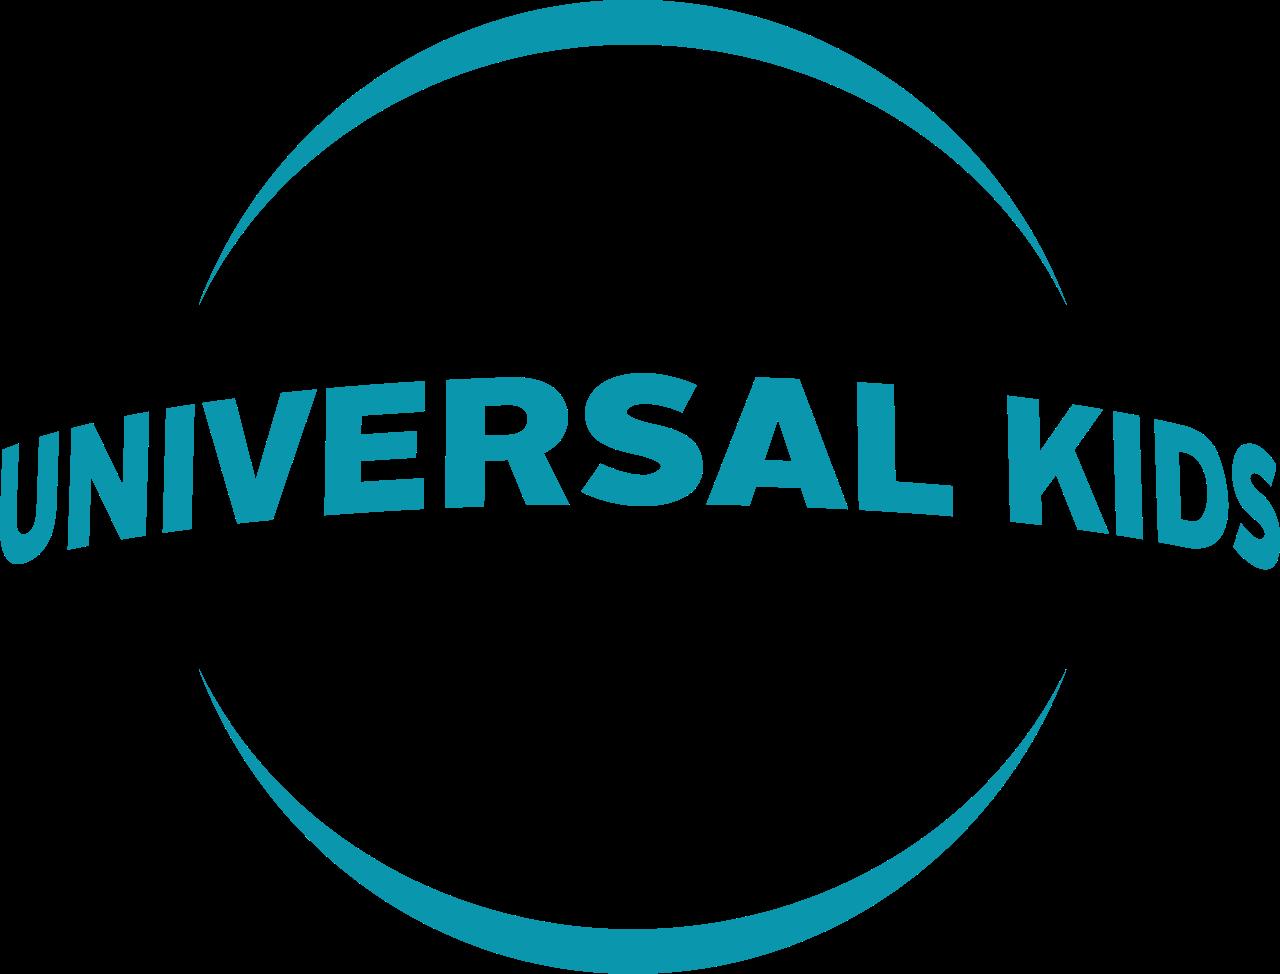 universalkids.png